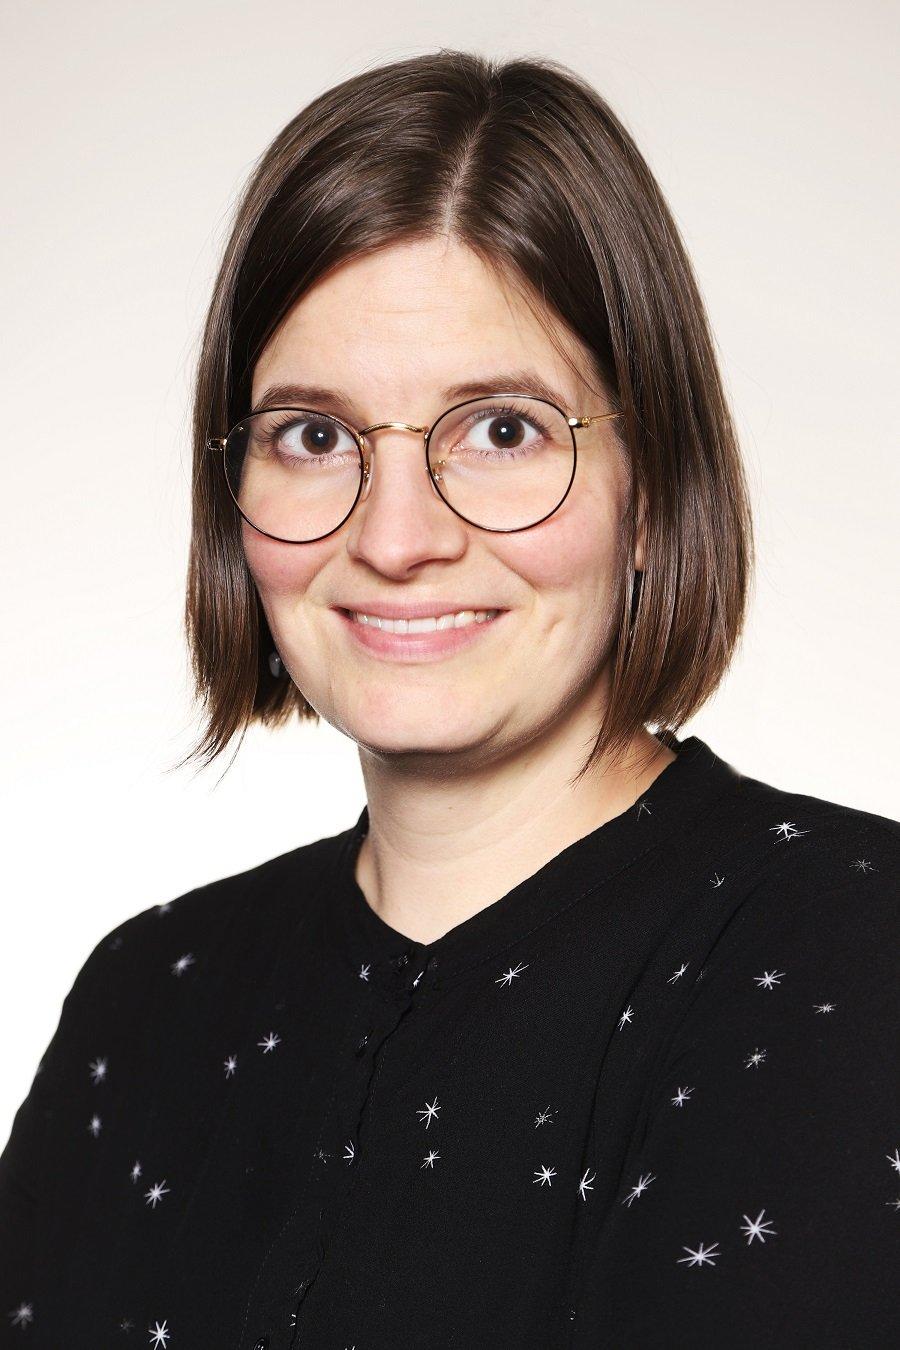 Sarah Dusend